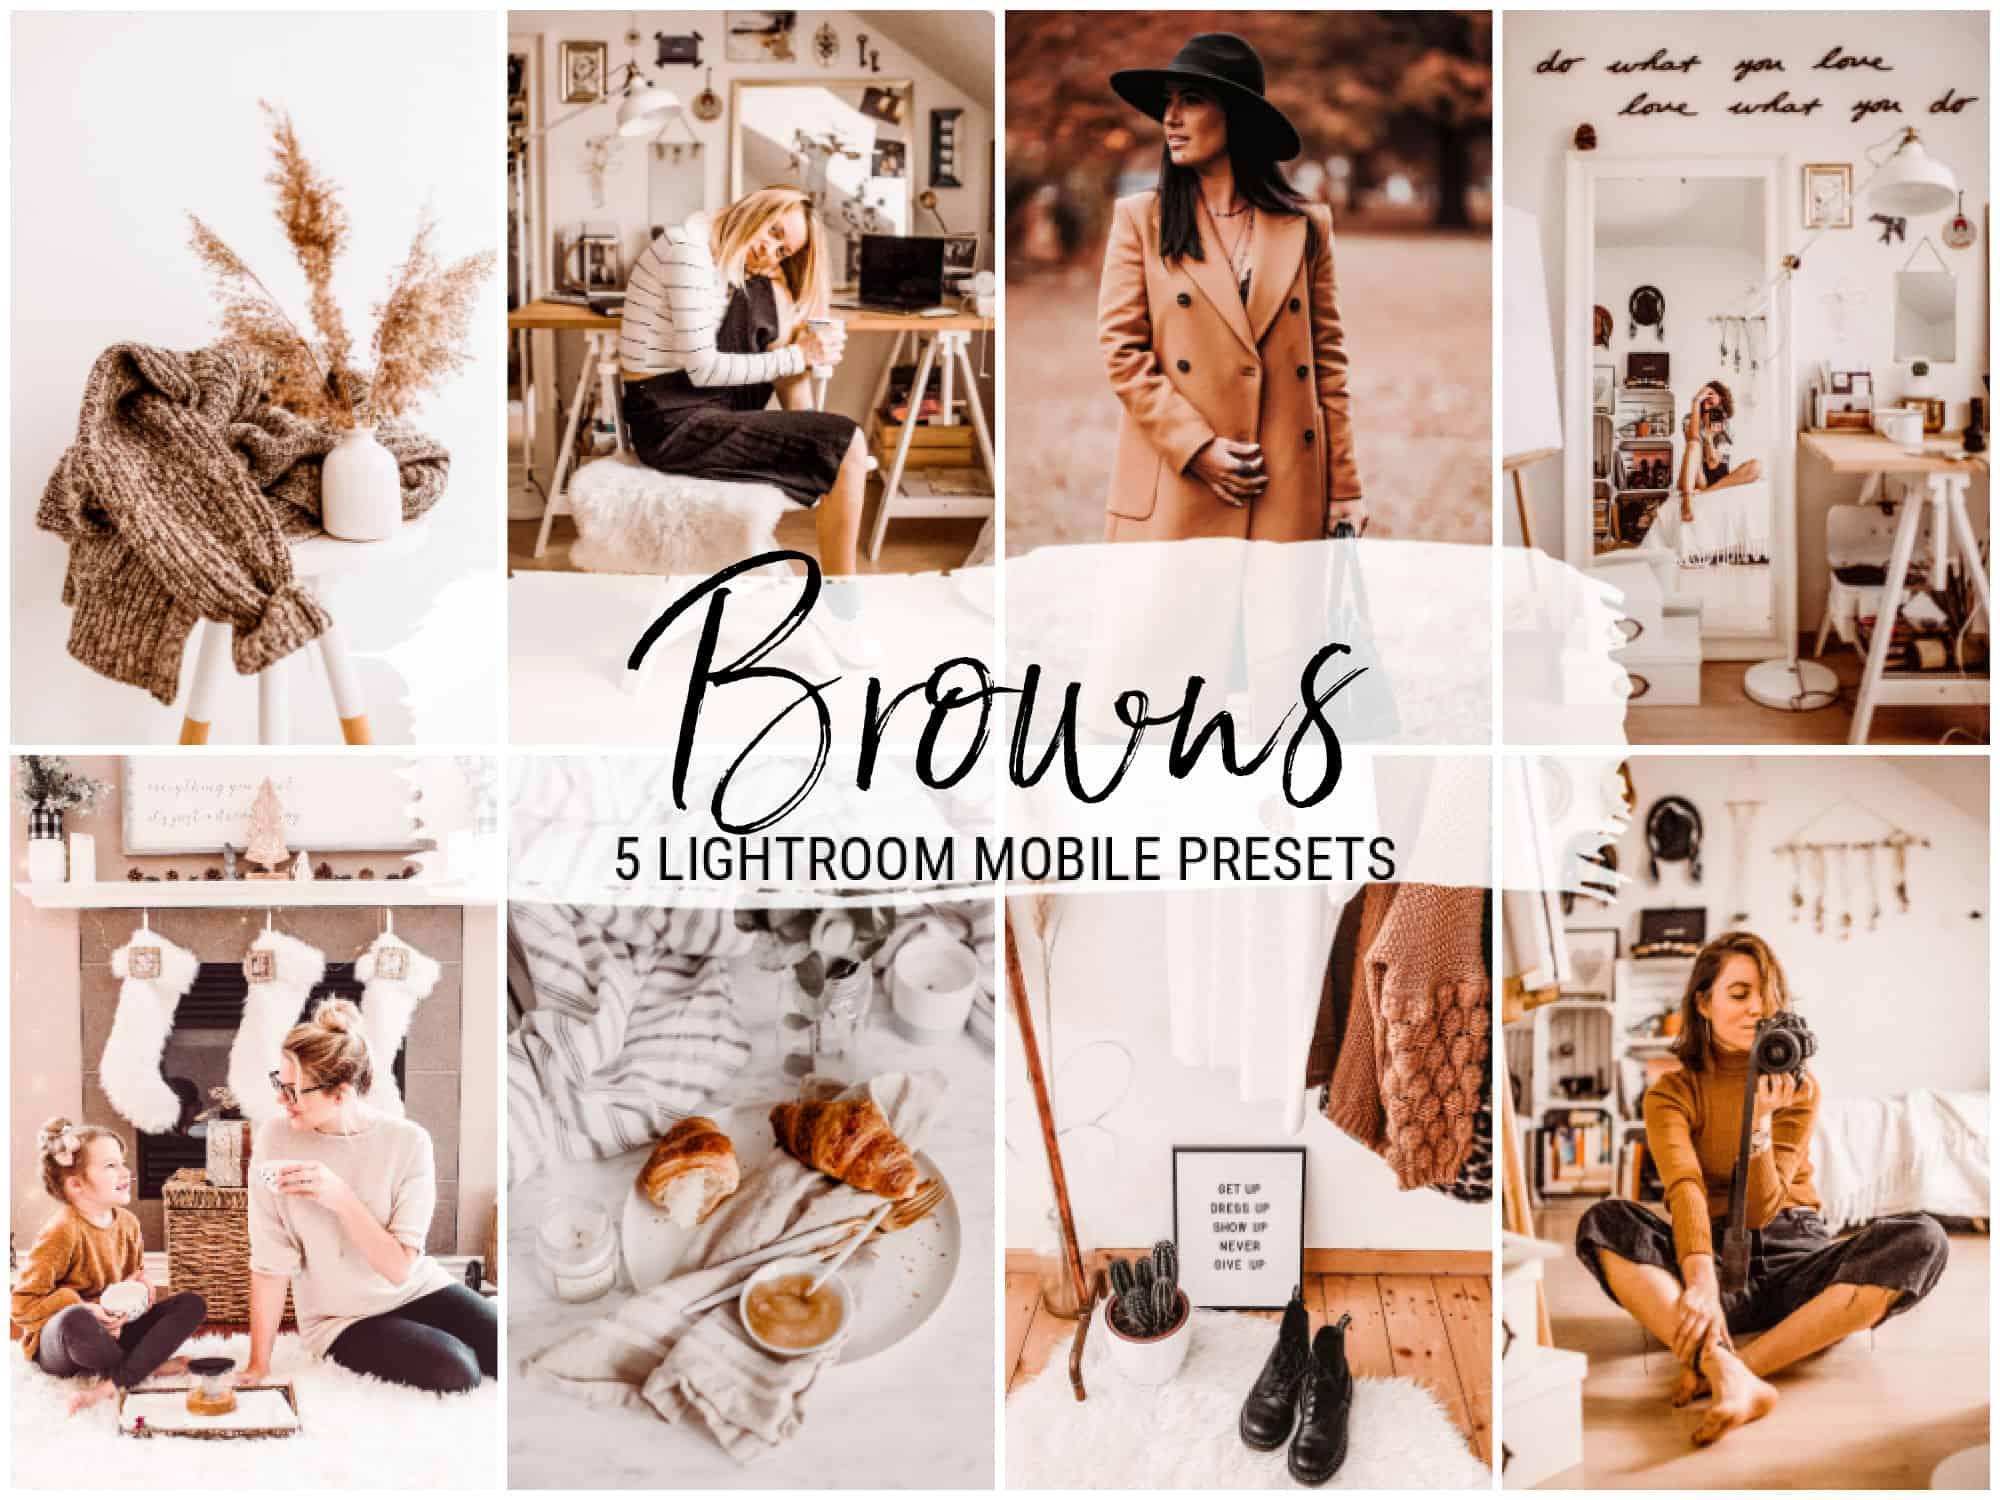 Browns bright lightroom presets